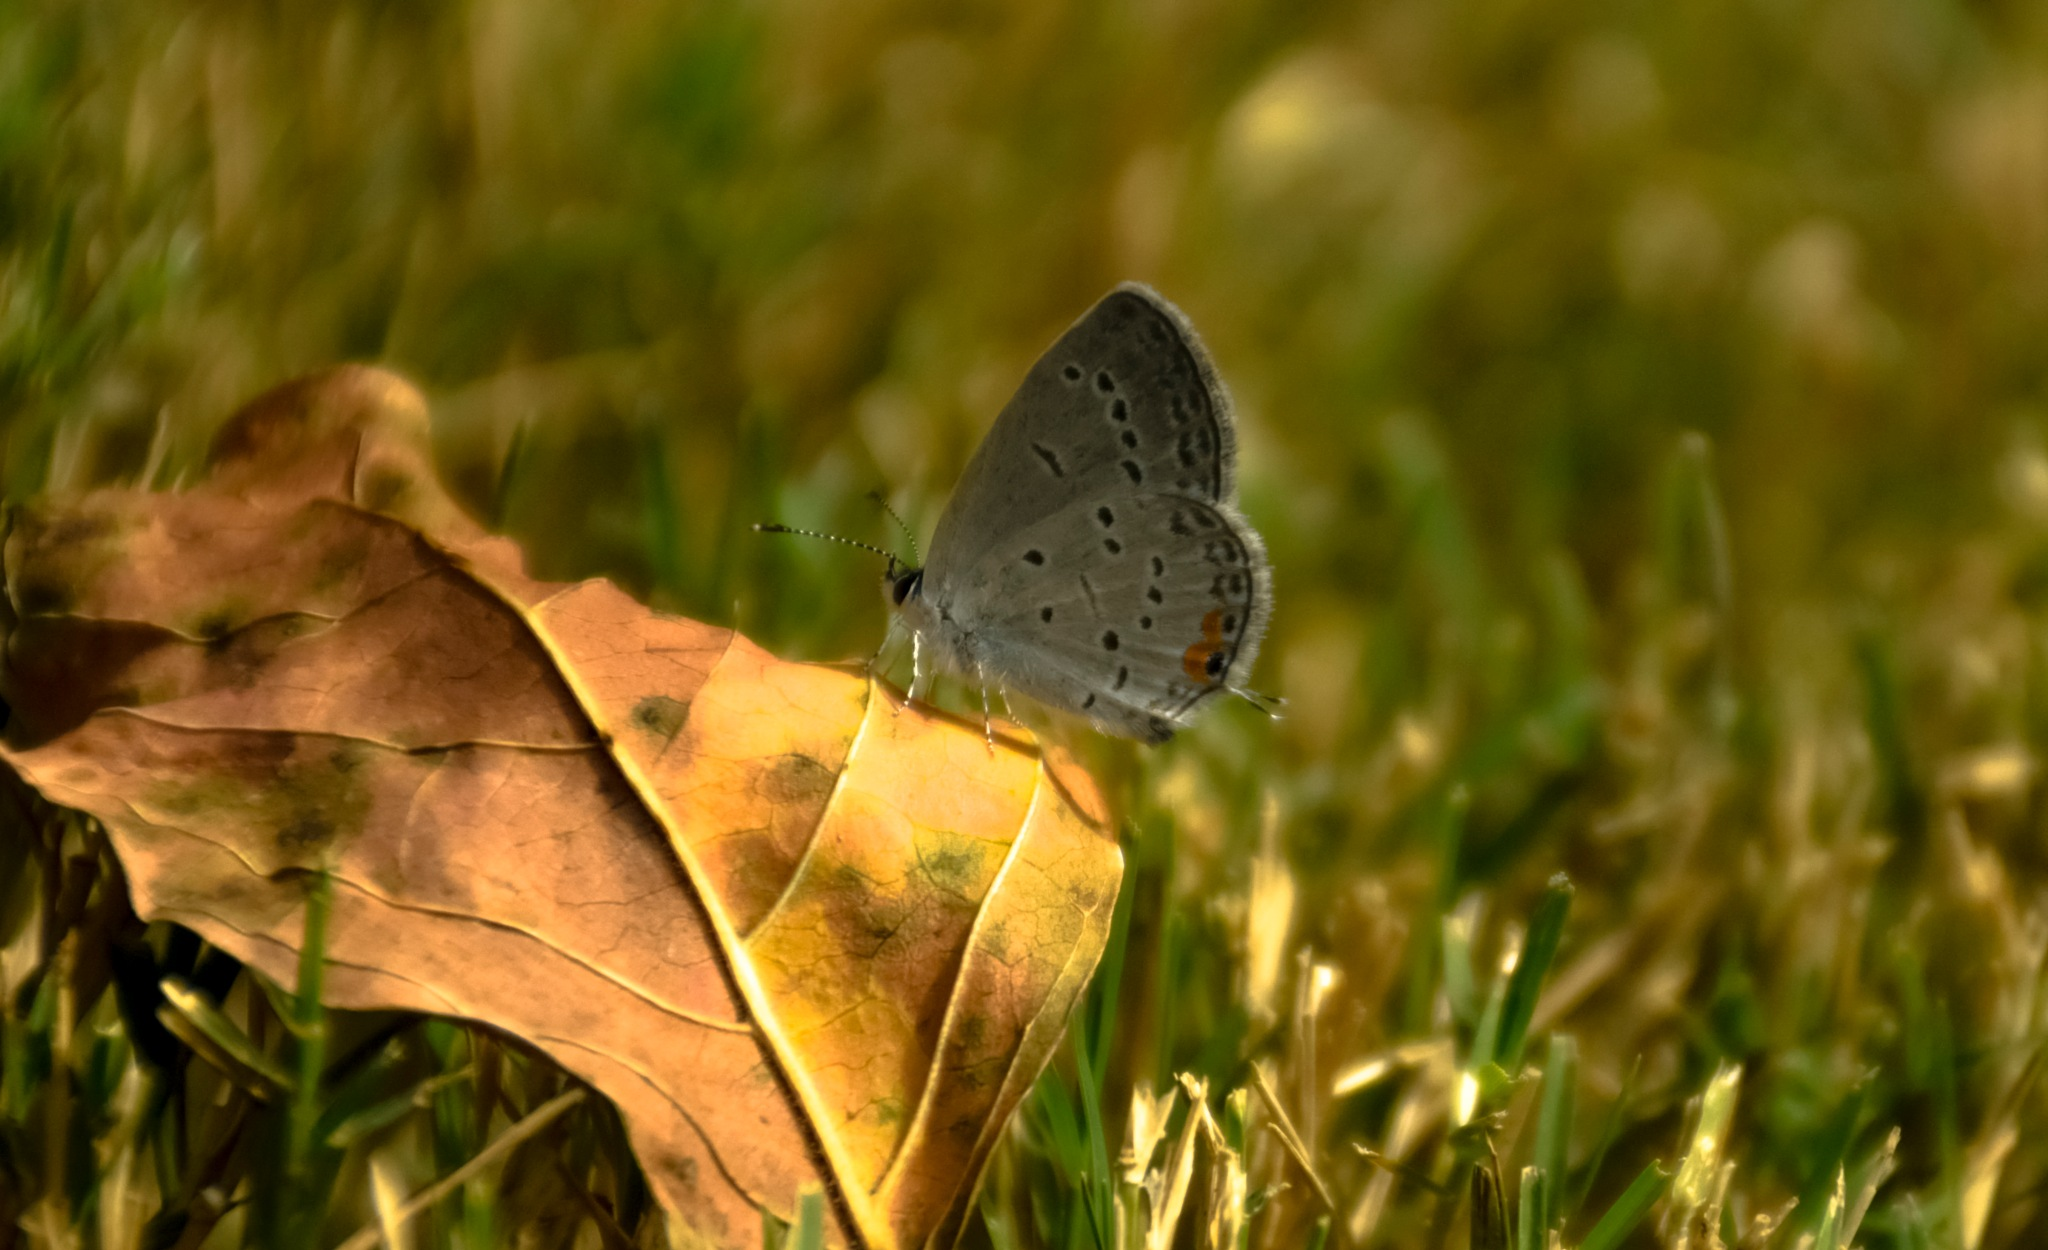 Enjoying the Sunshine On A Fall Leaf!  :) by kathy.herriottmeyers